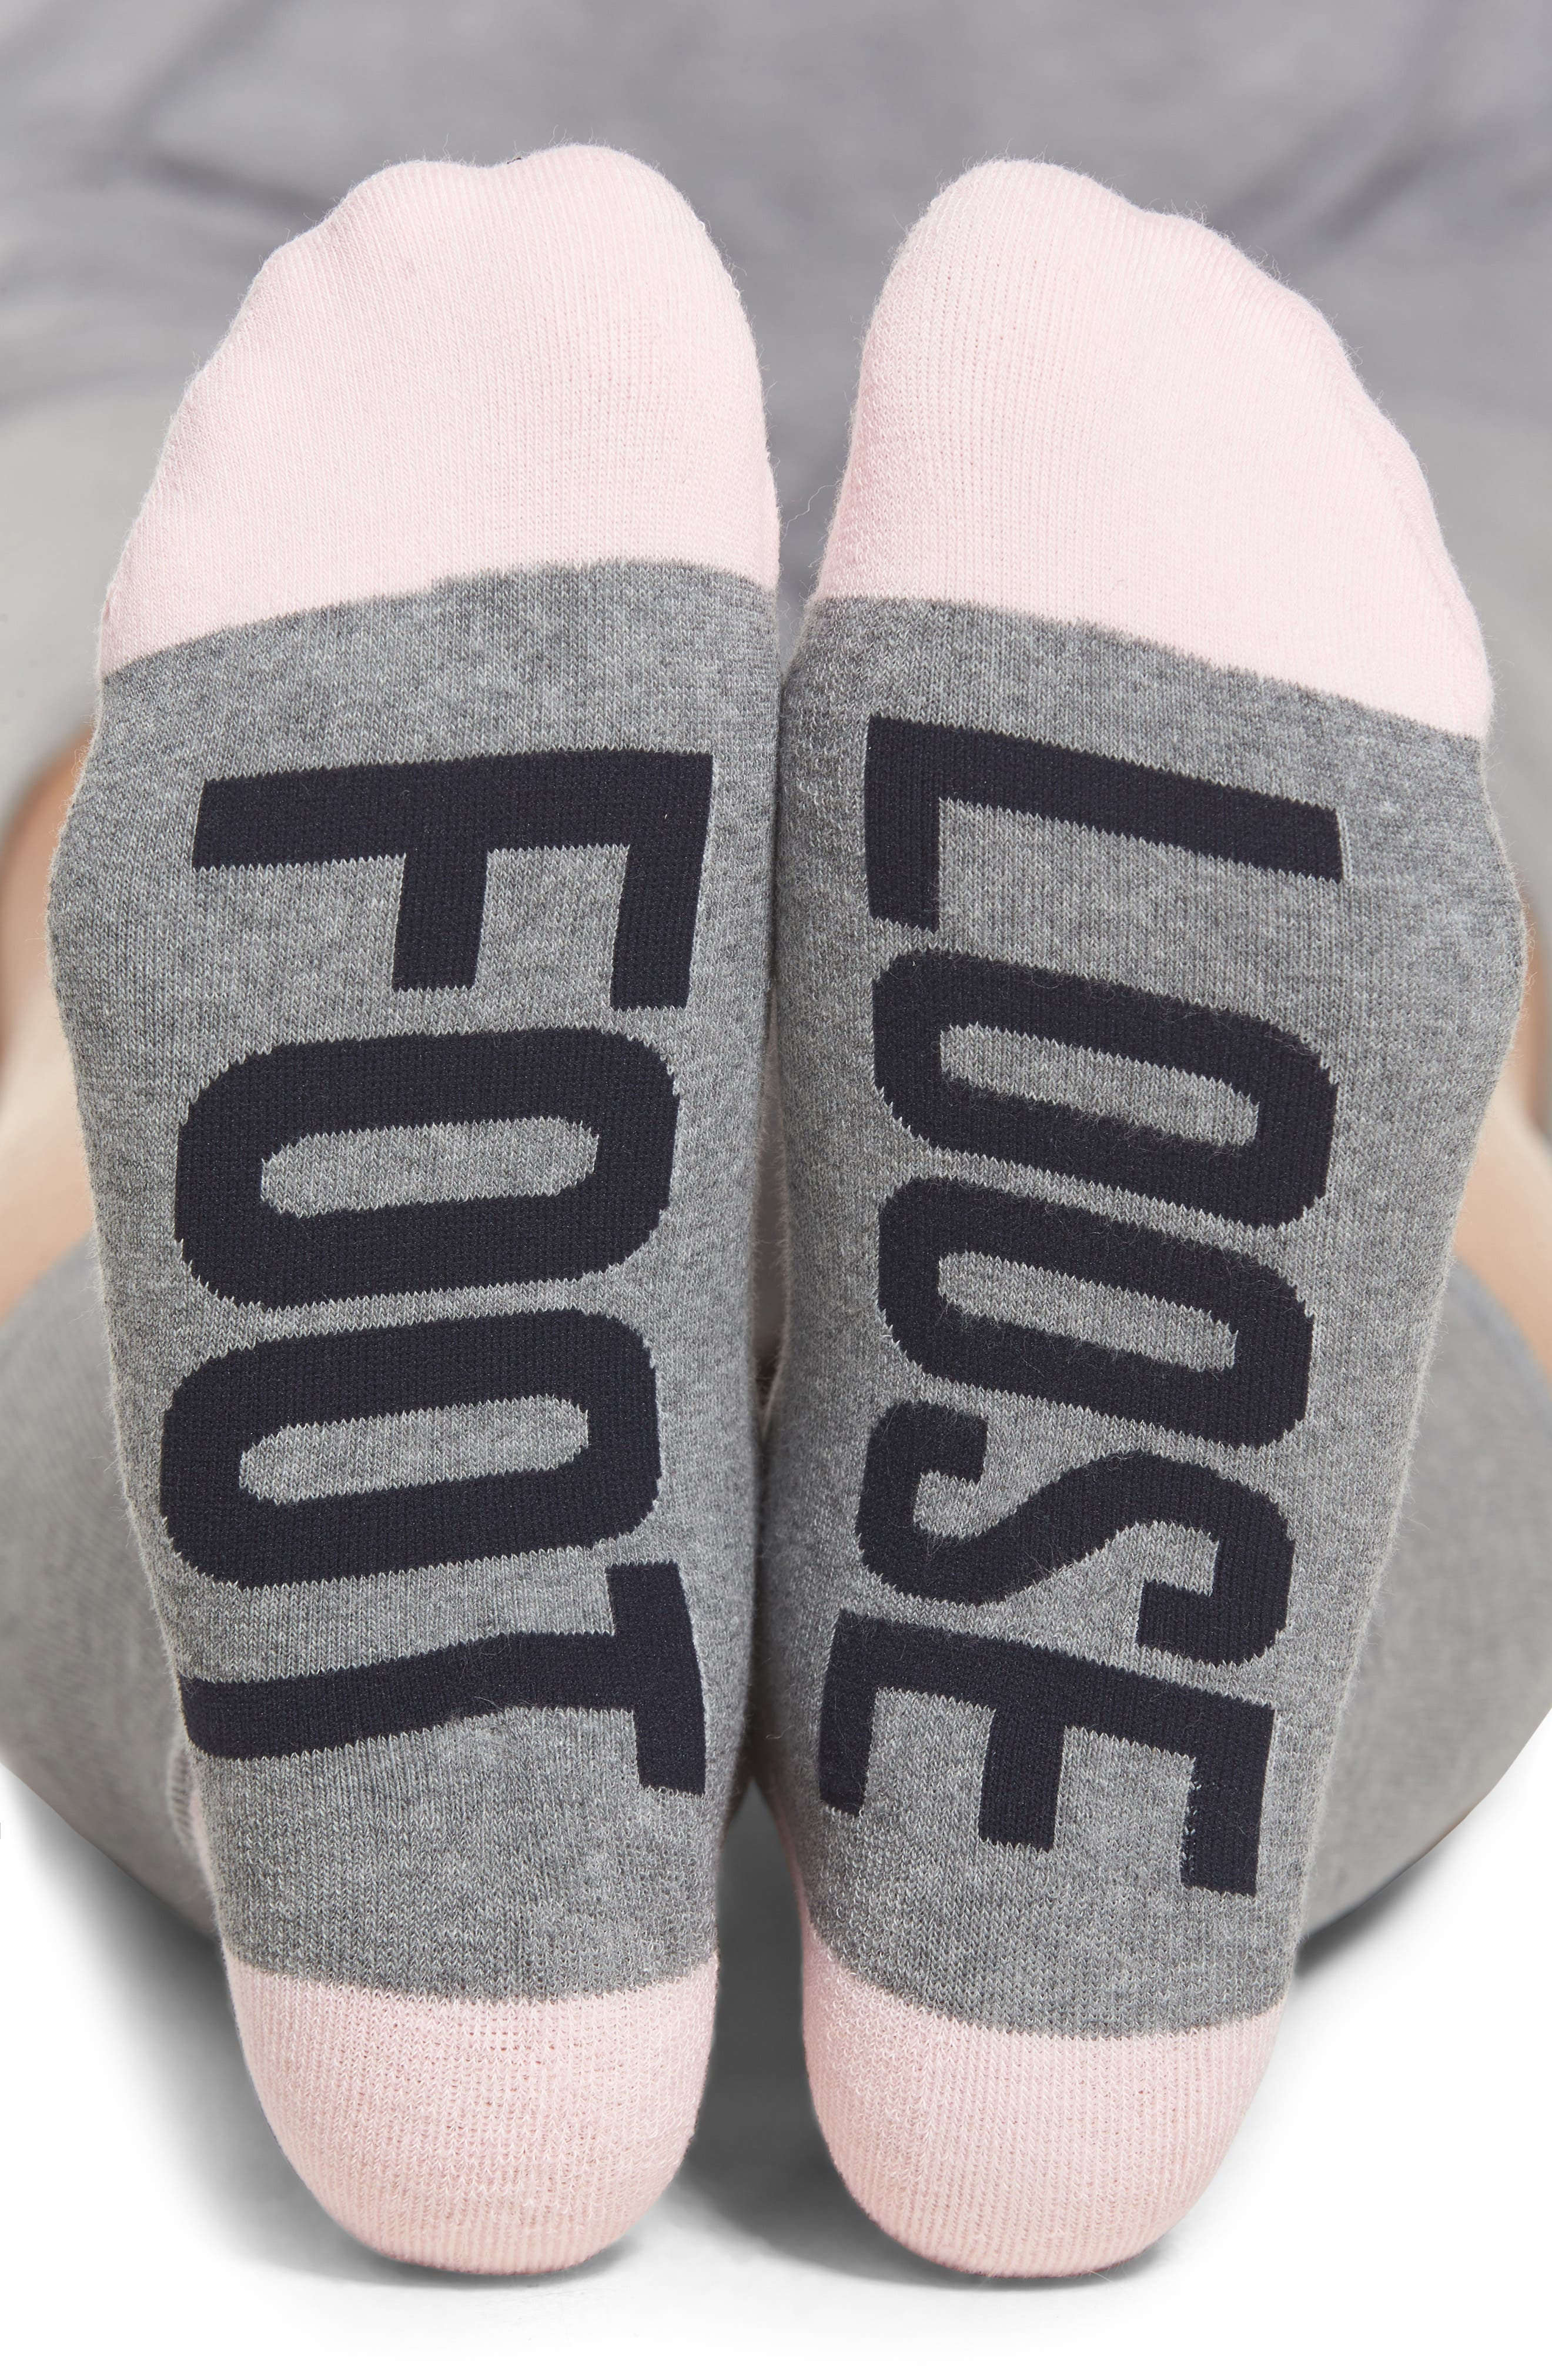 Foot Loose Crew Socks,                             Main thumbnail 1, color,                             Grey Heather